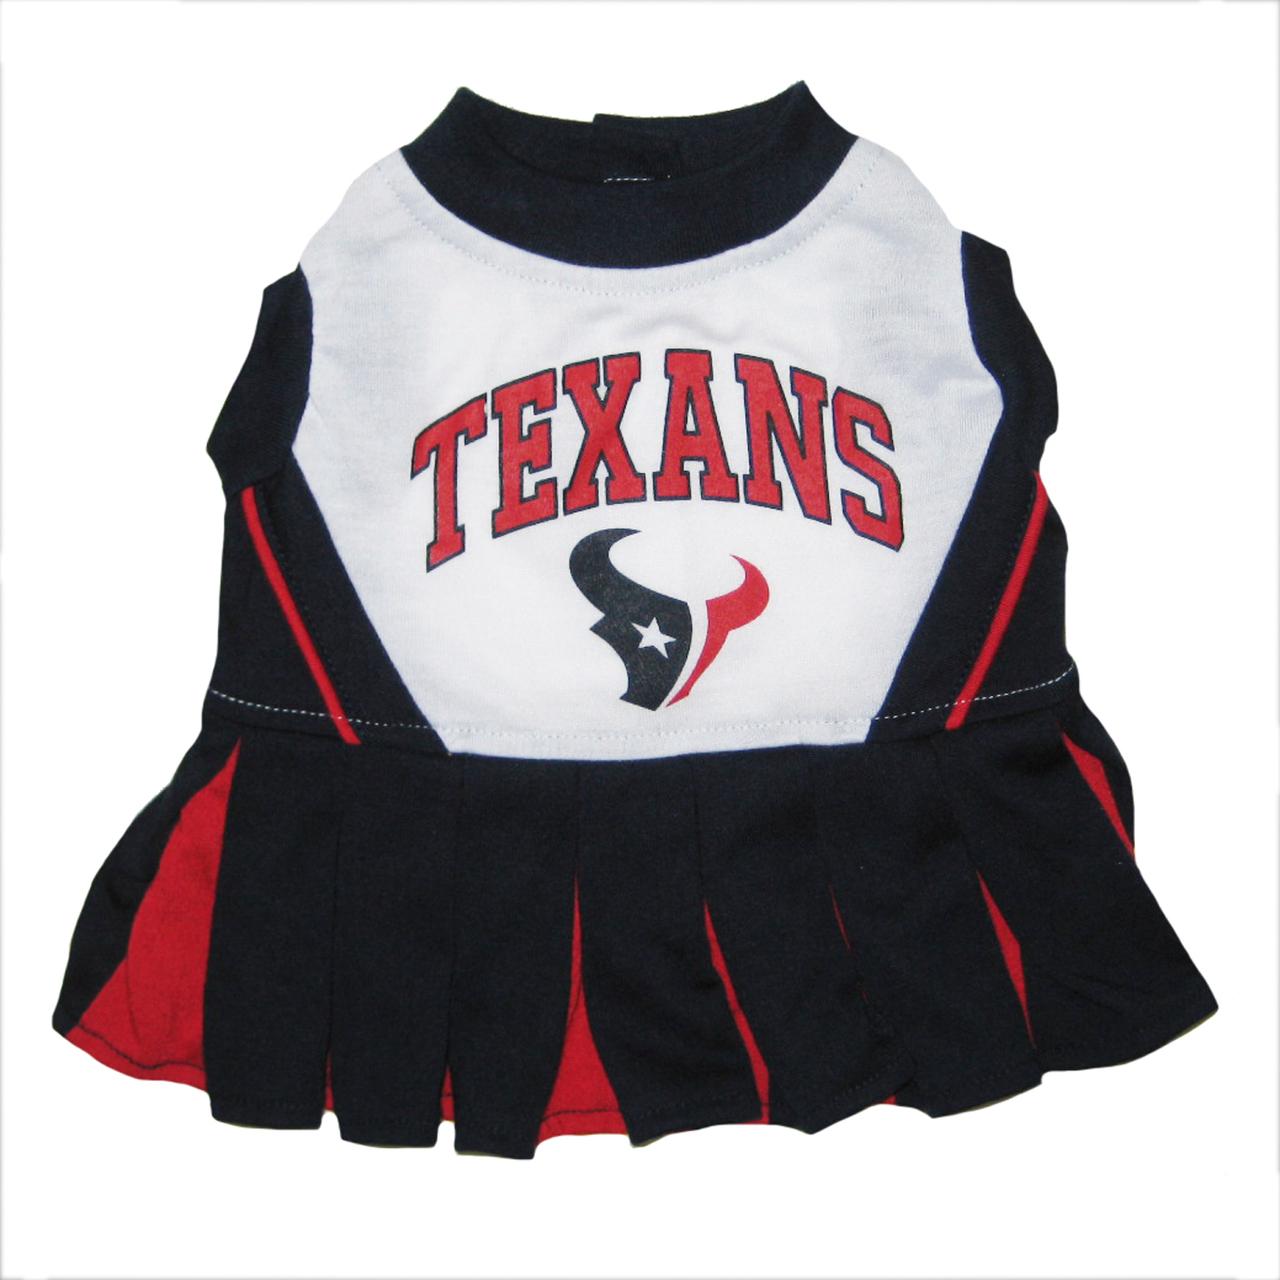 Hot Dog Houston Texans NFL Football Pet Cheerleader Outfit